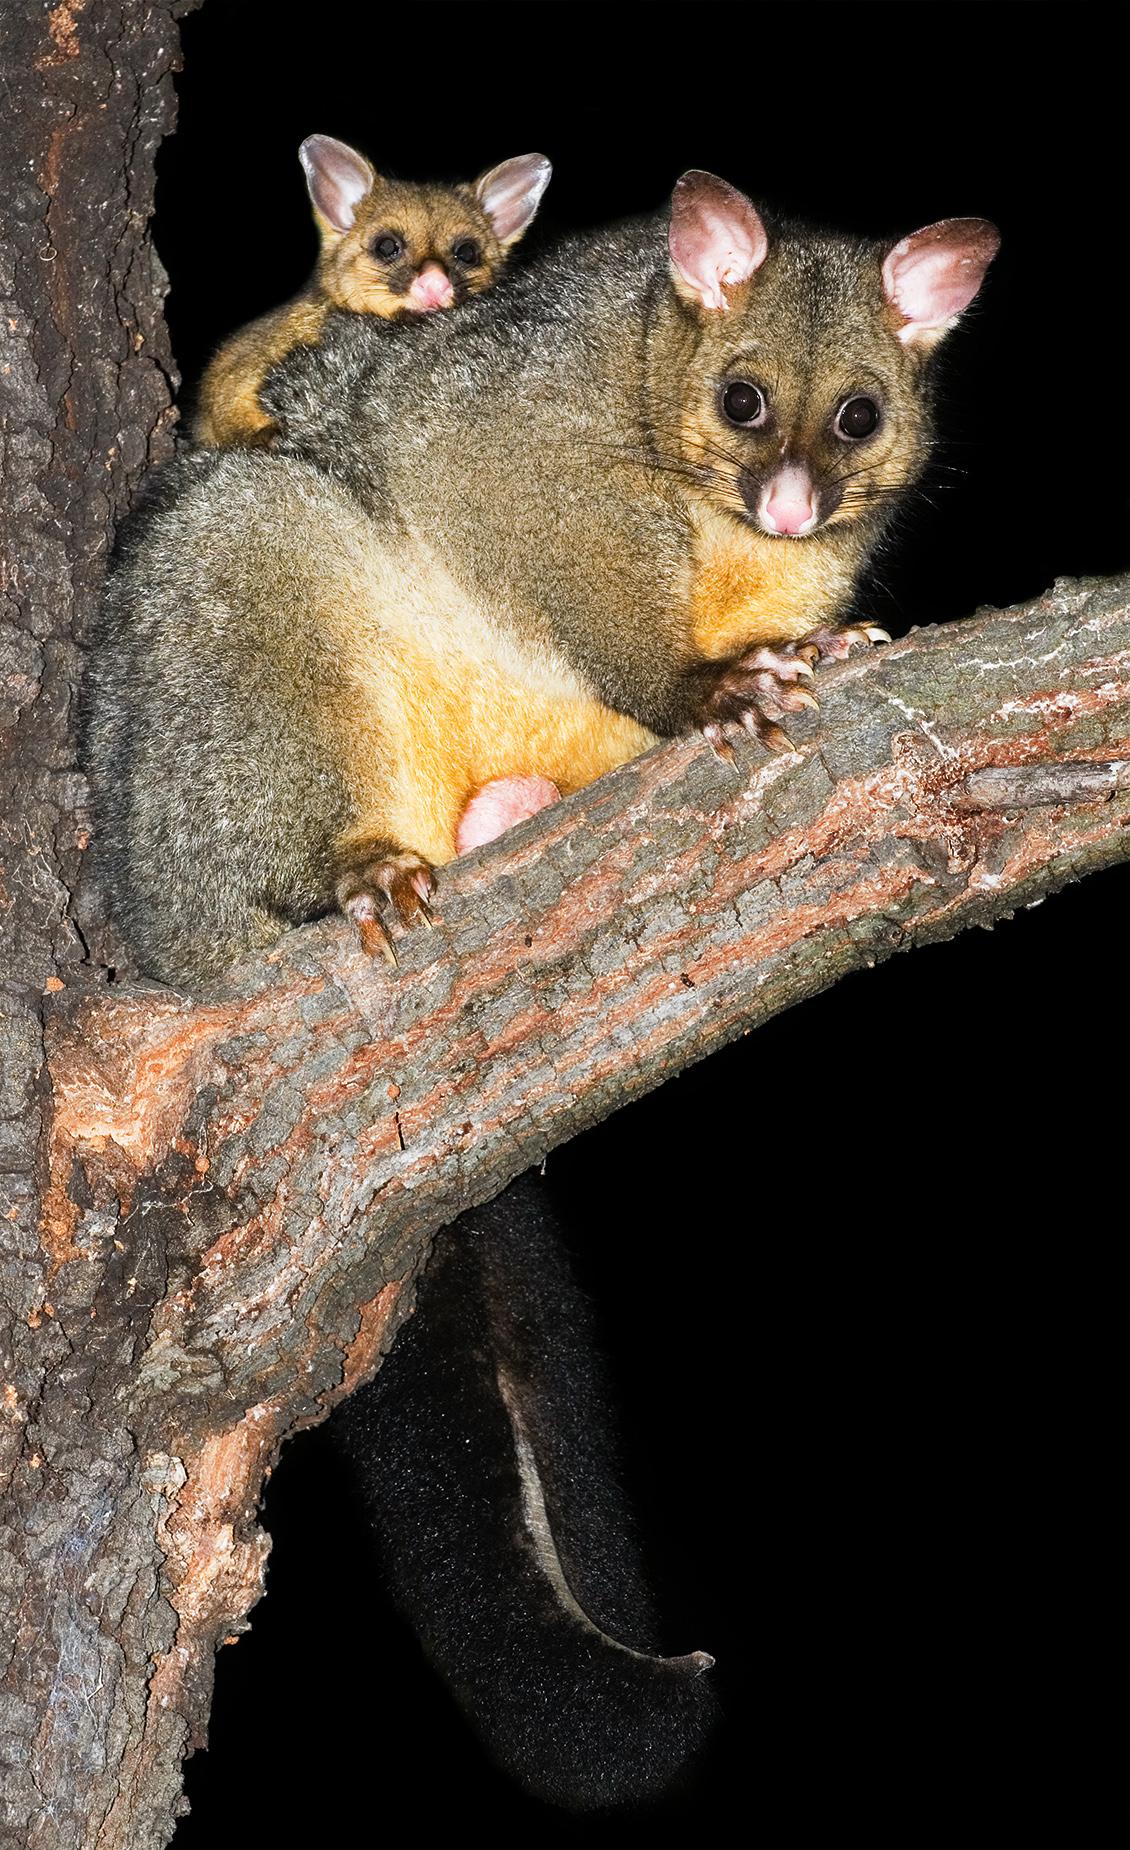 Common Brushtail Possum 1